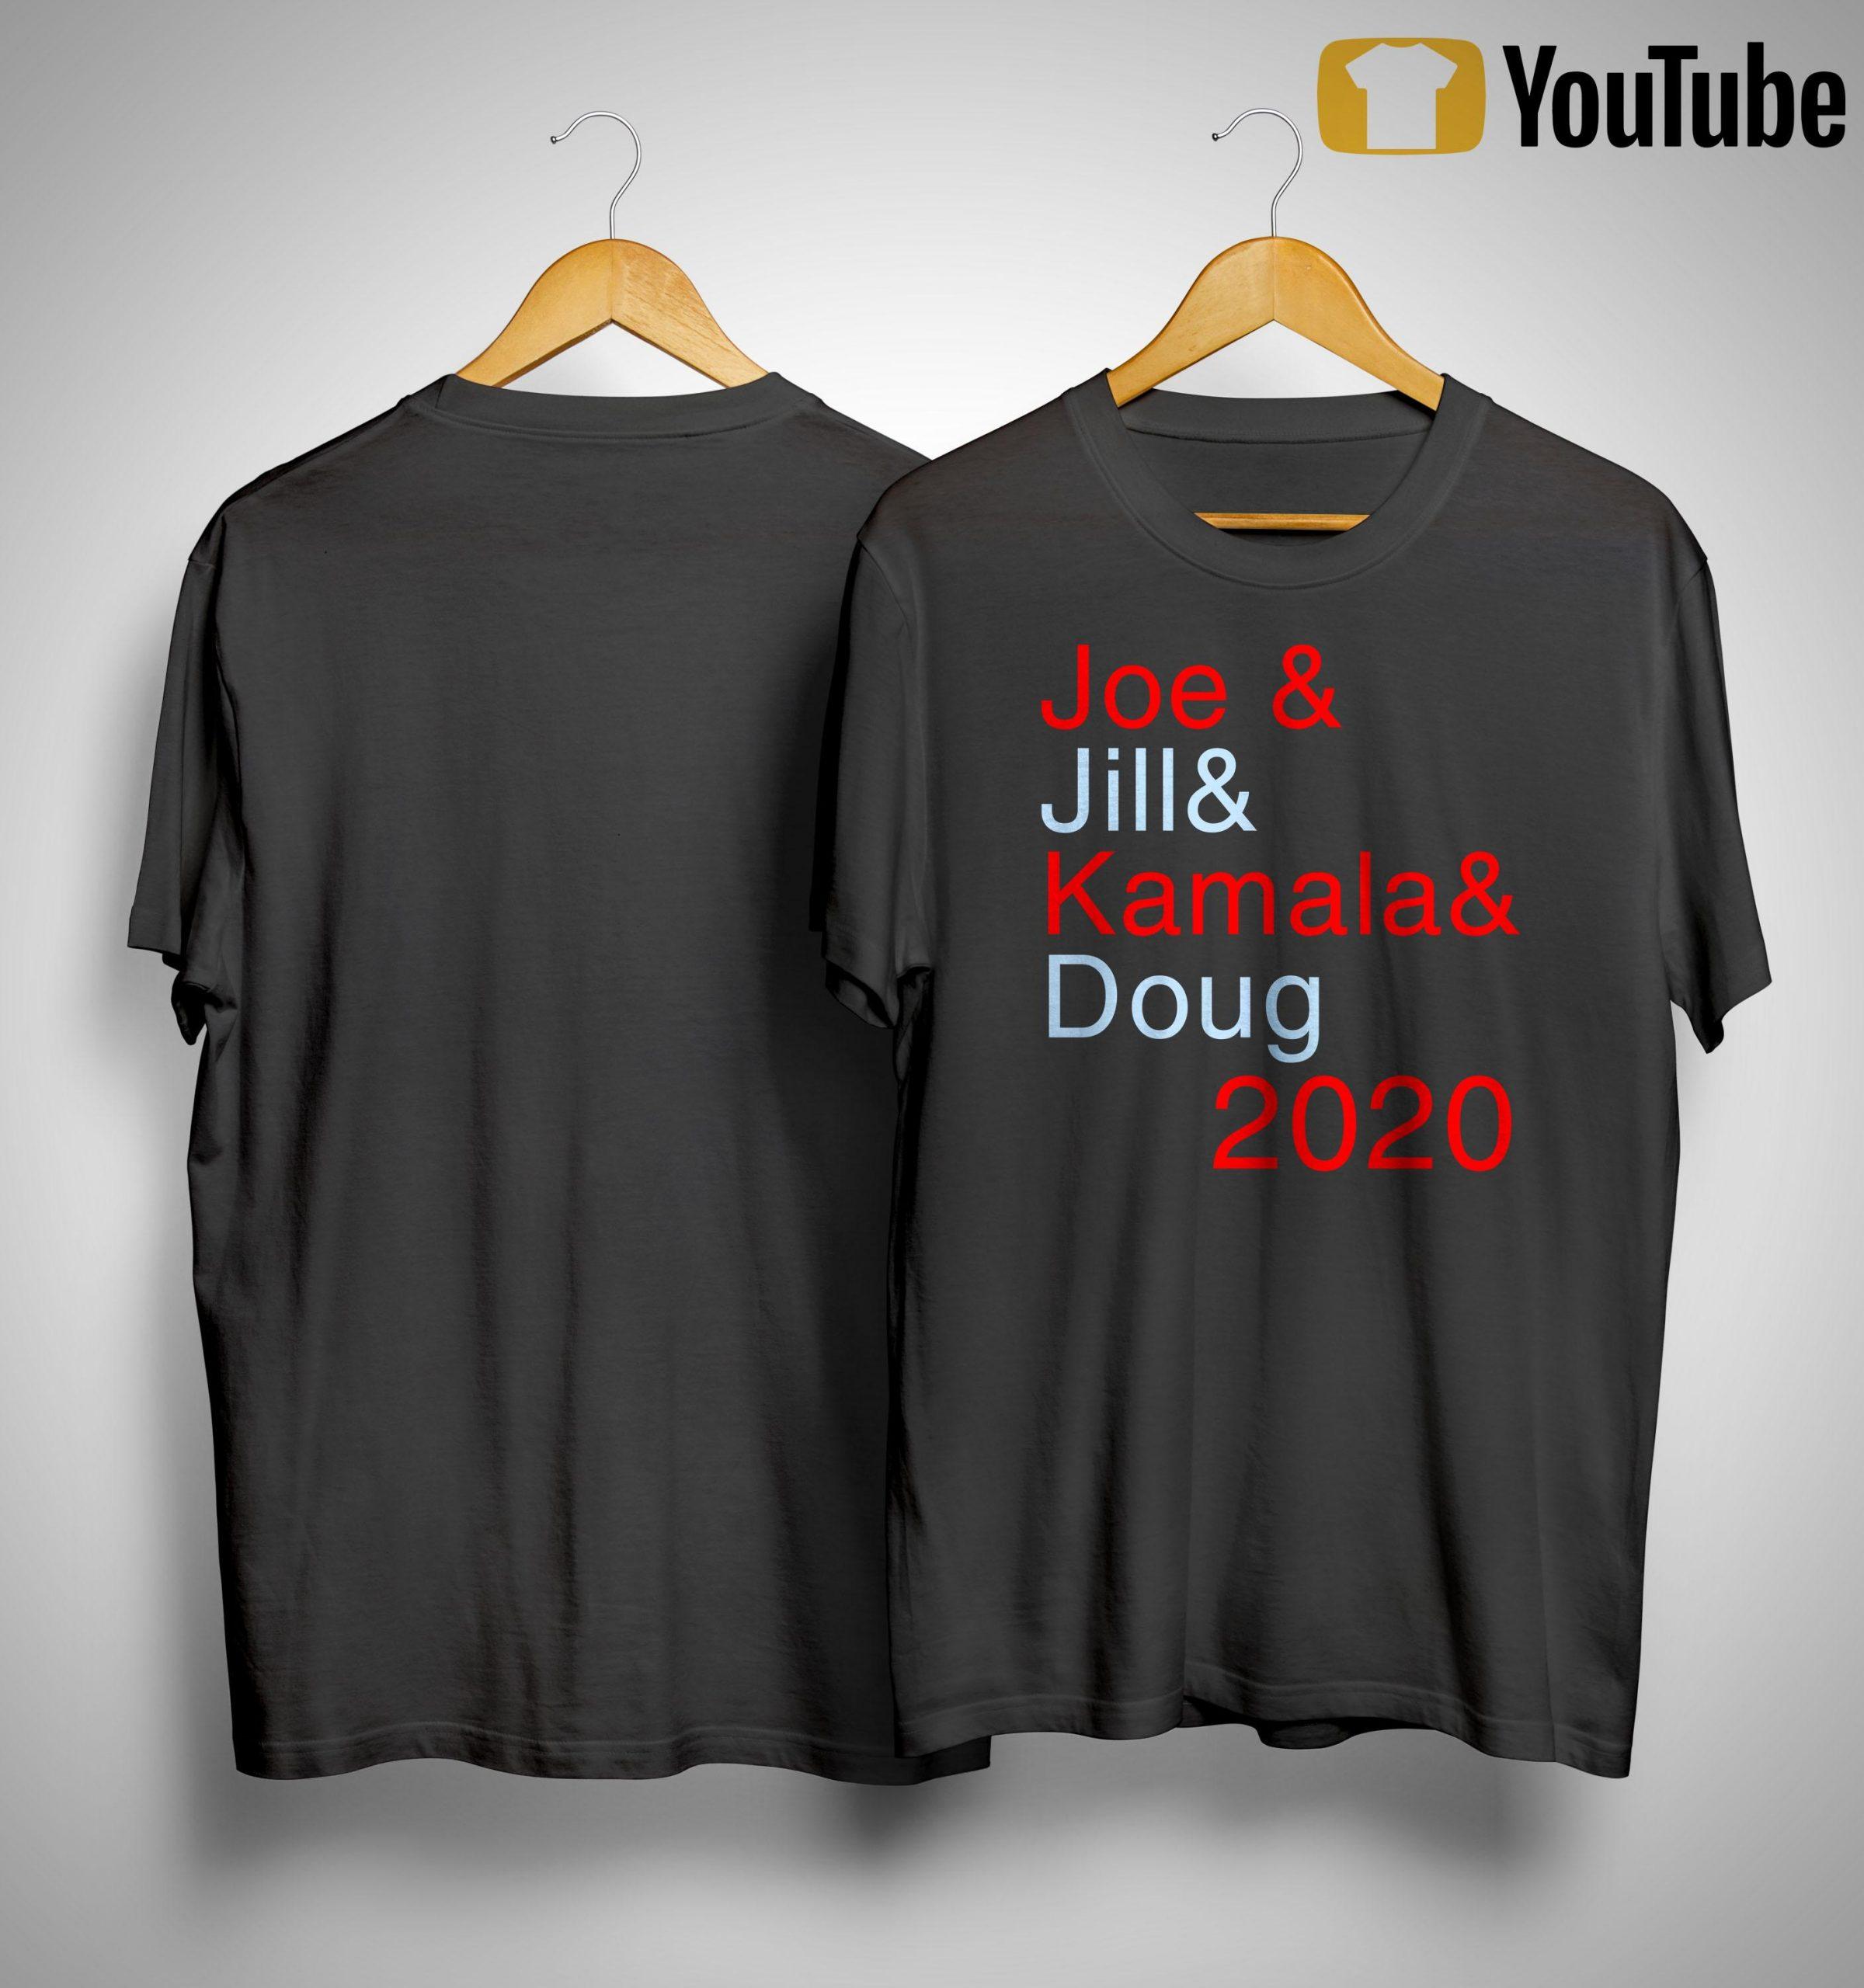 Joe & Jill & Kamala & Doug 2020 Shirt